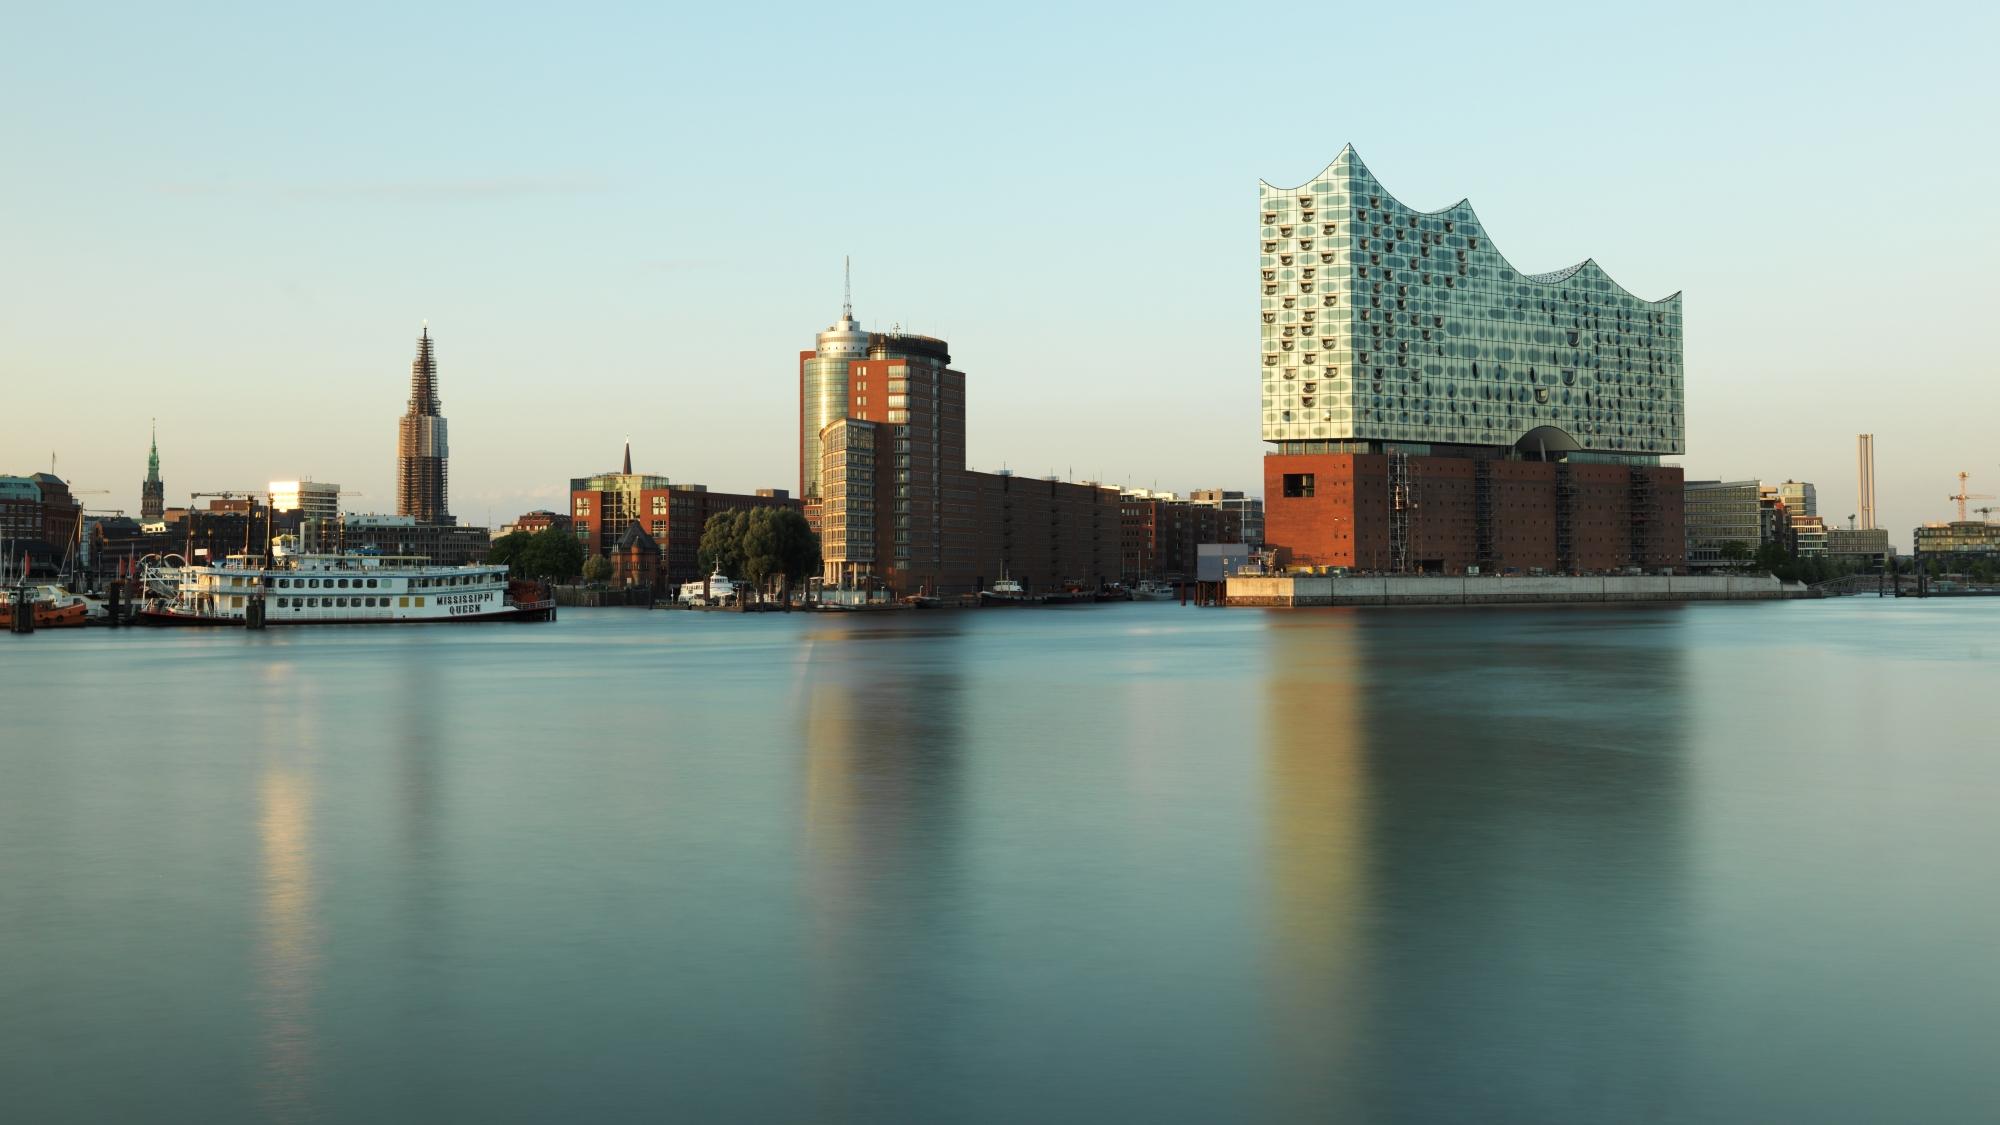 © SVEN MAHN – Hasselblad H5D-40, 23 s, f/11, 50 mm, ISO100